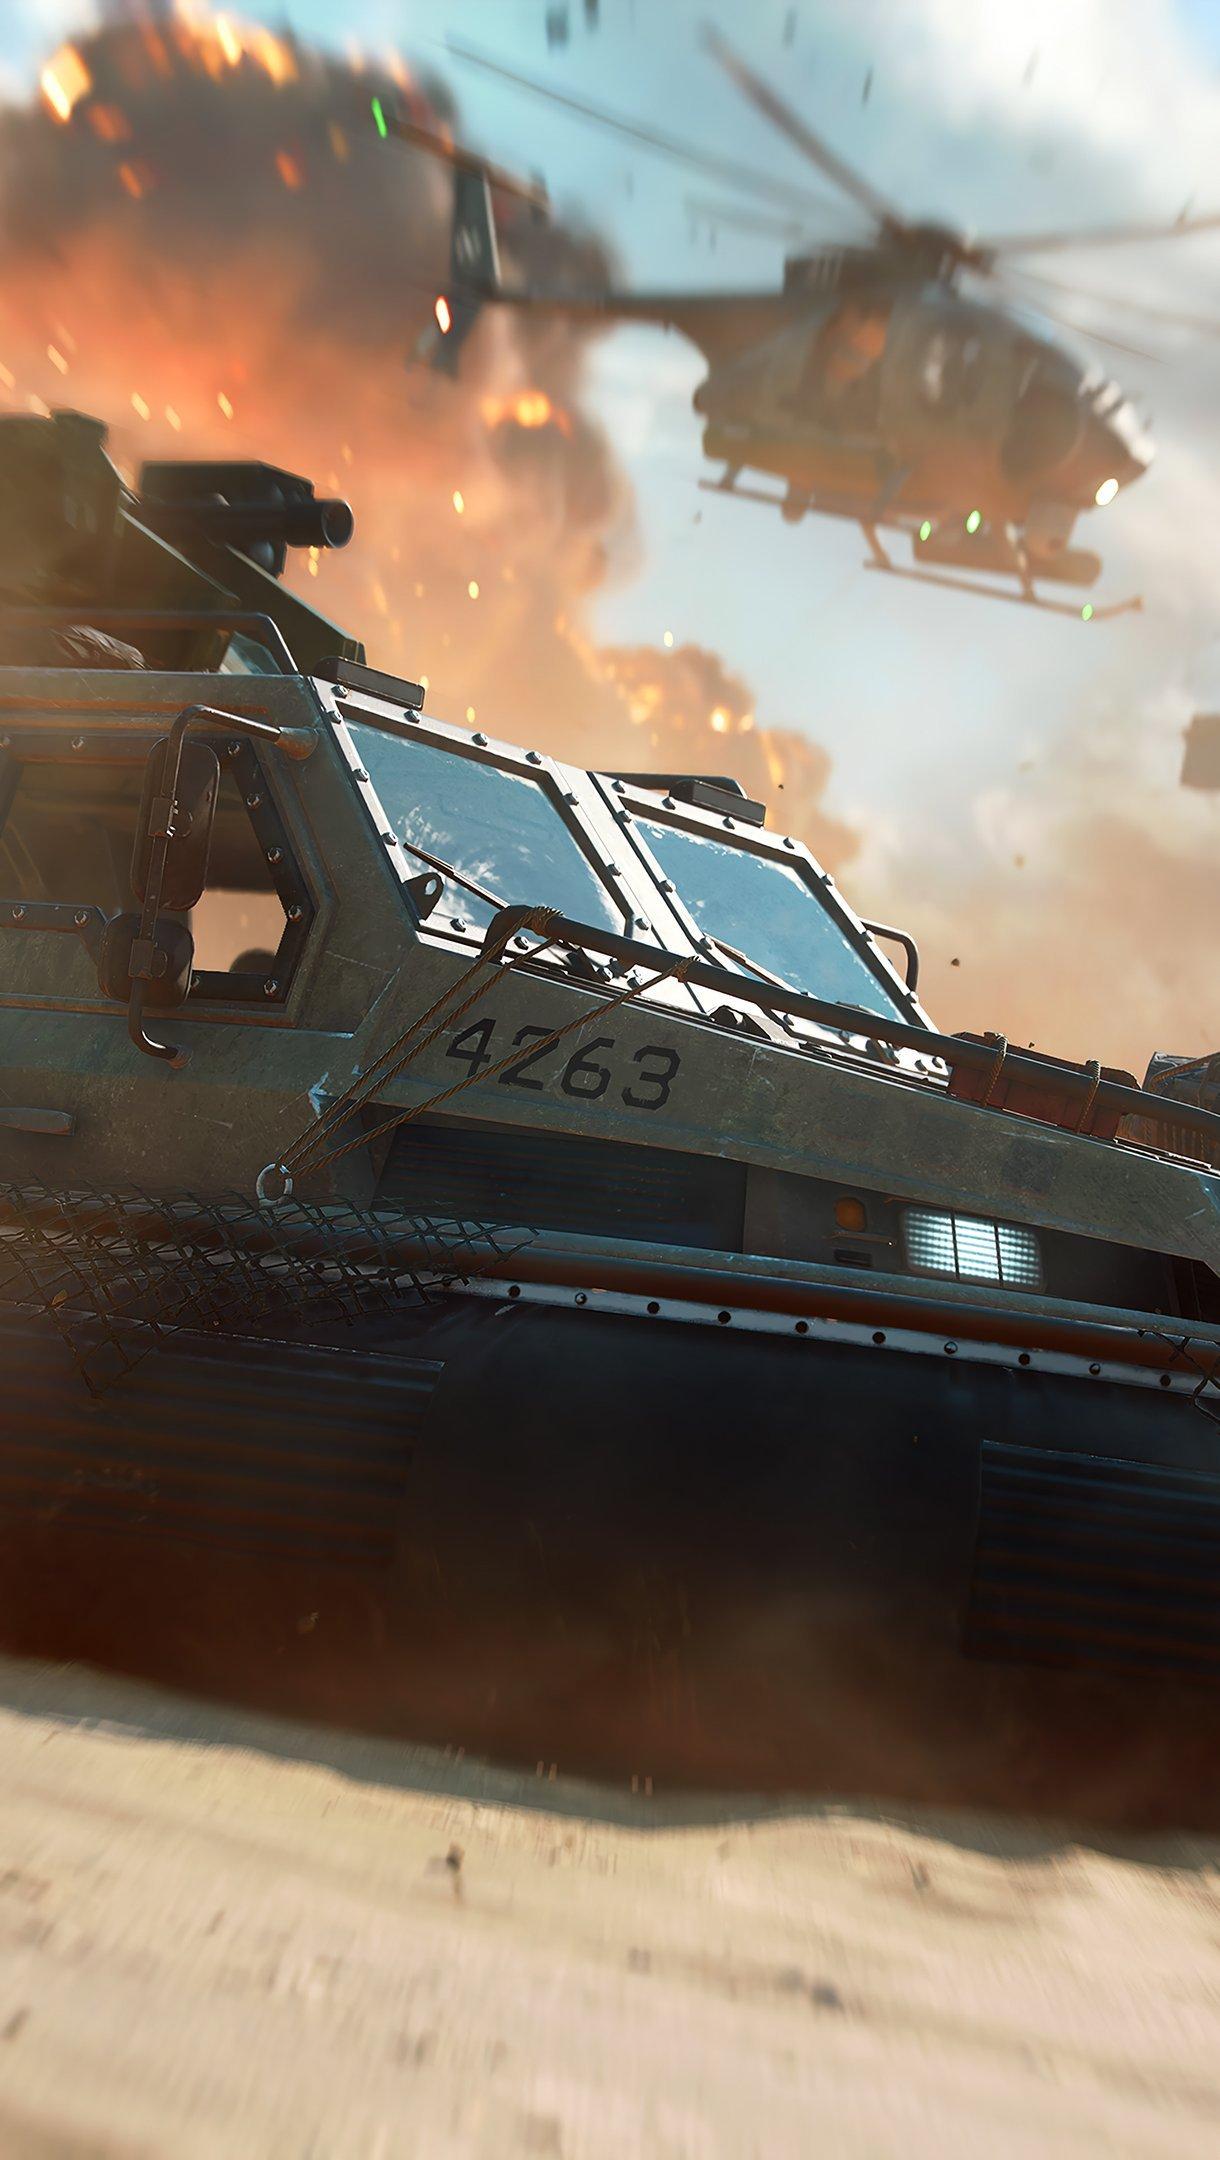 Fondos de pantalla Battlefield 2042 Vertical